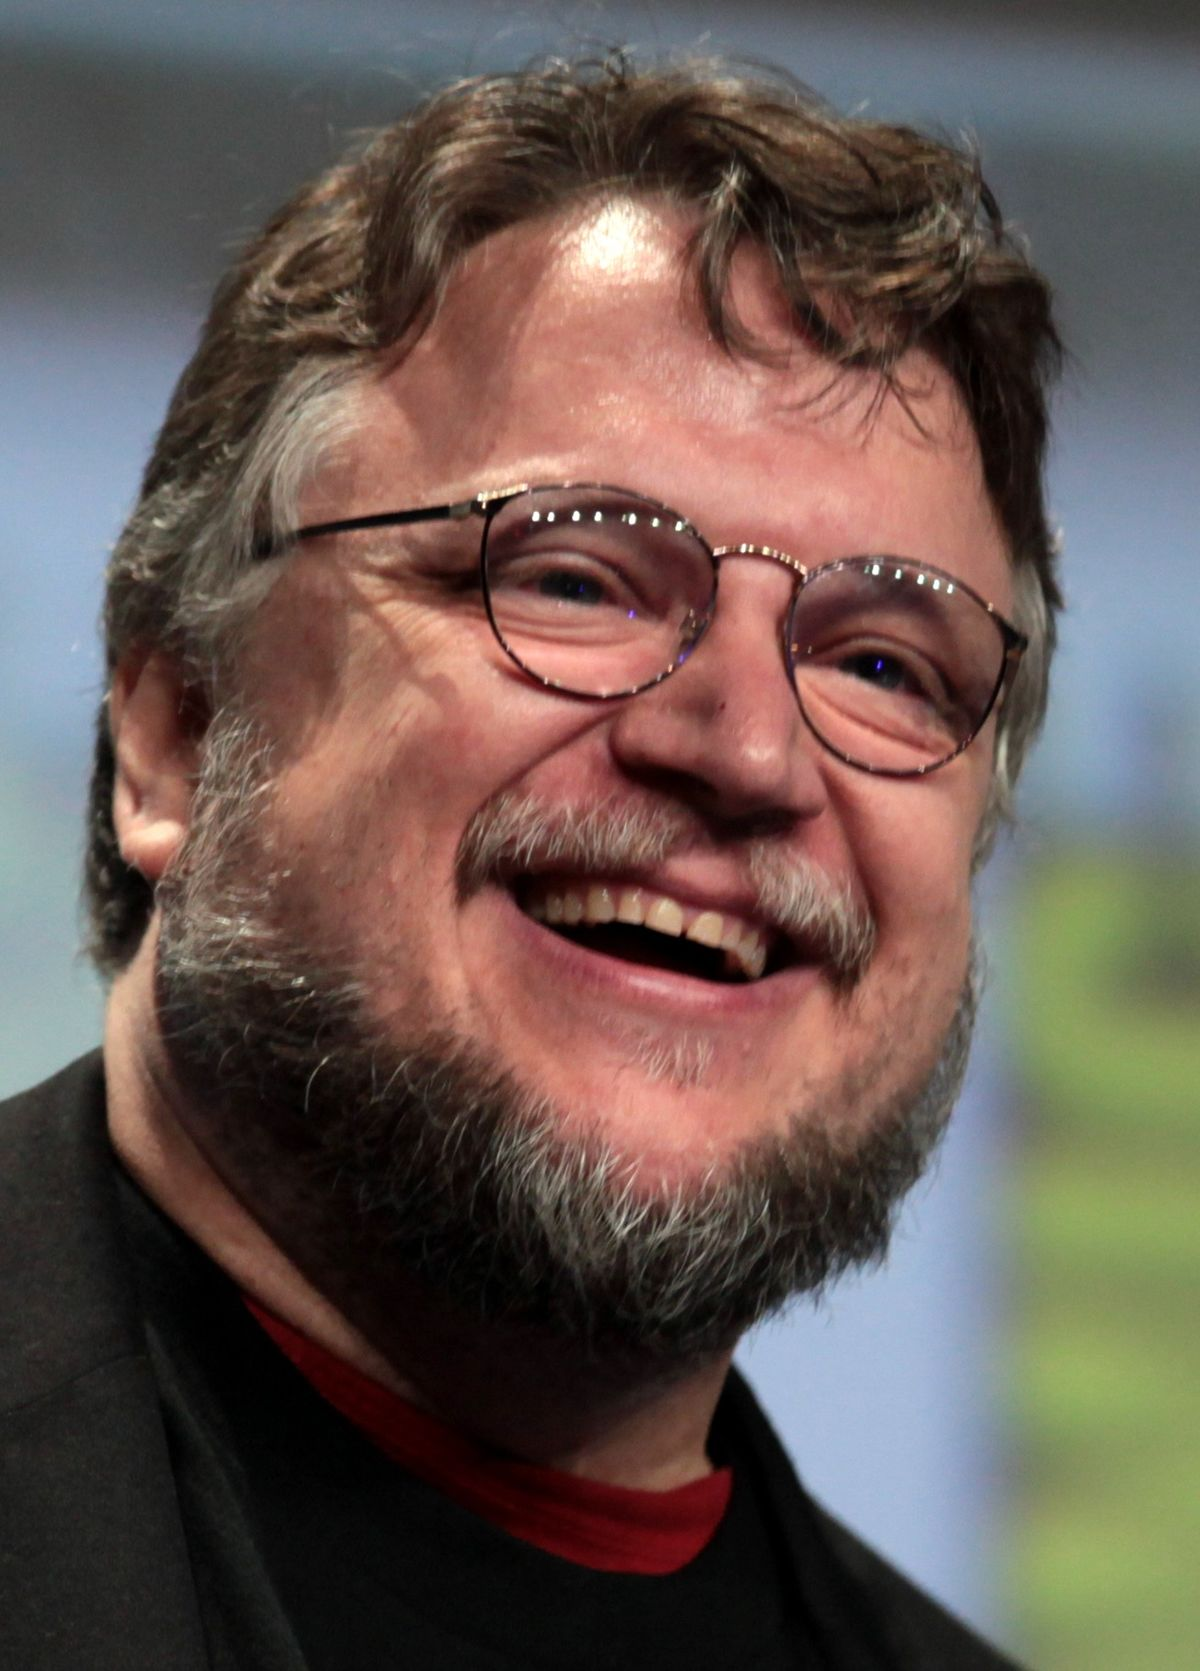 Del Del Toro Guillermo Guillermo Del Toro Guillermo Guillermo Del Guillermo Toro Toro Del sQhdxrCt